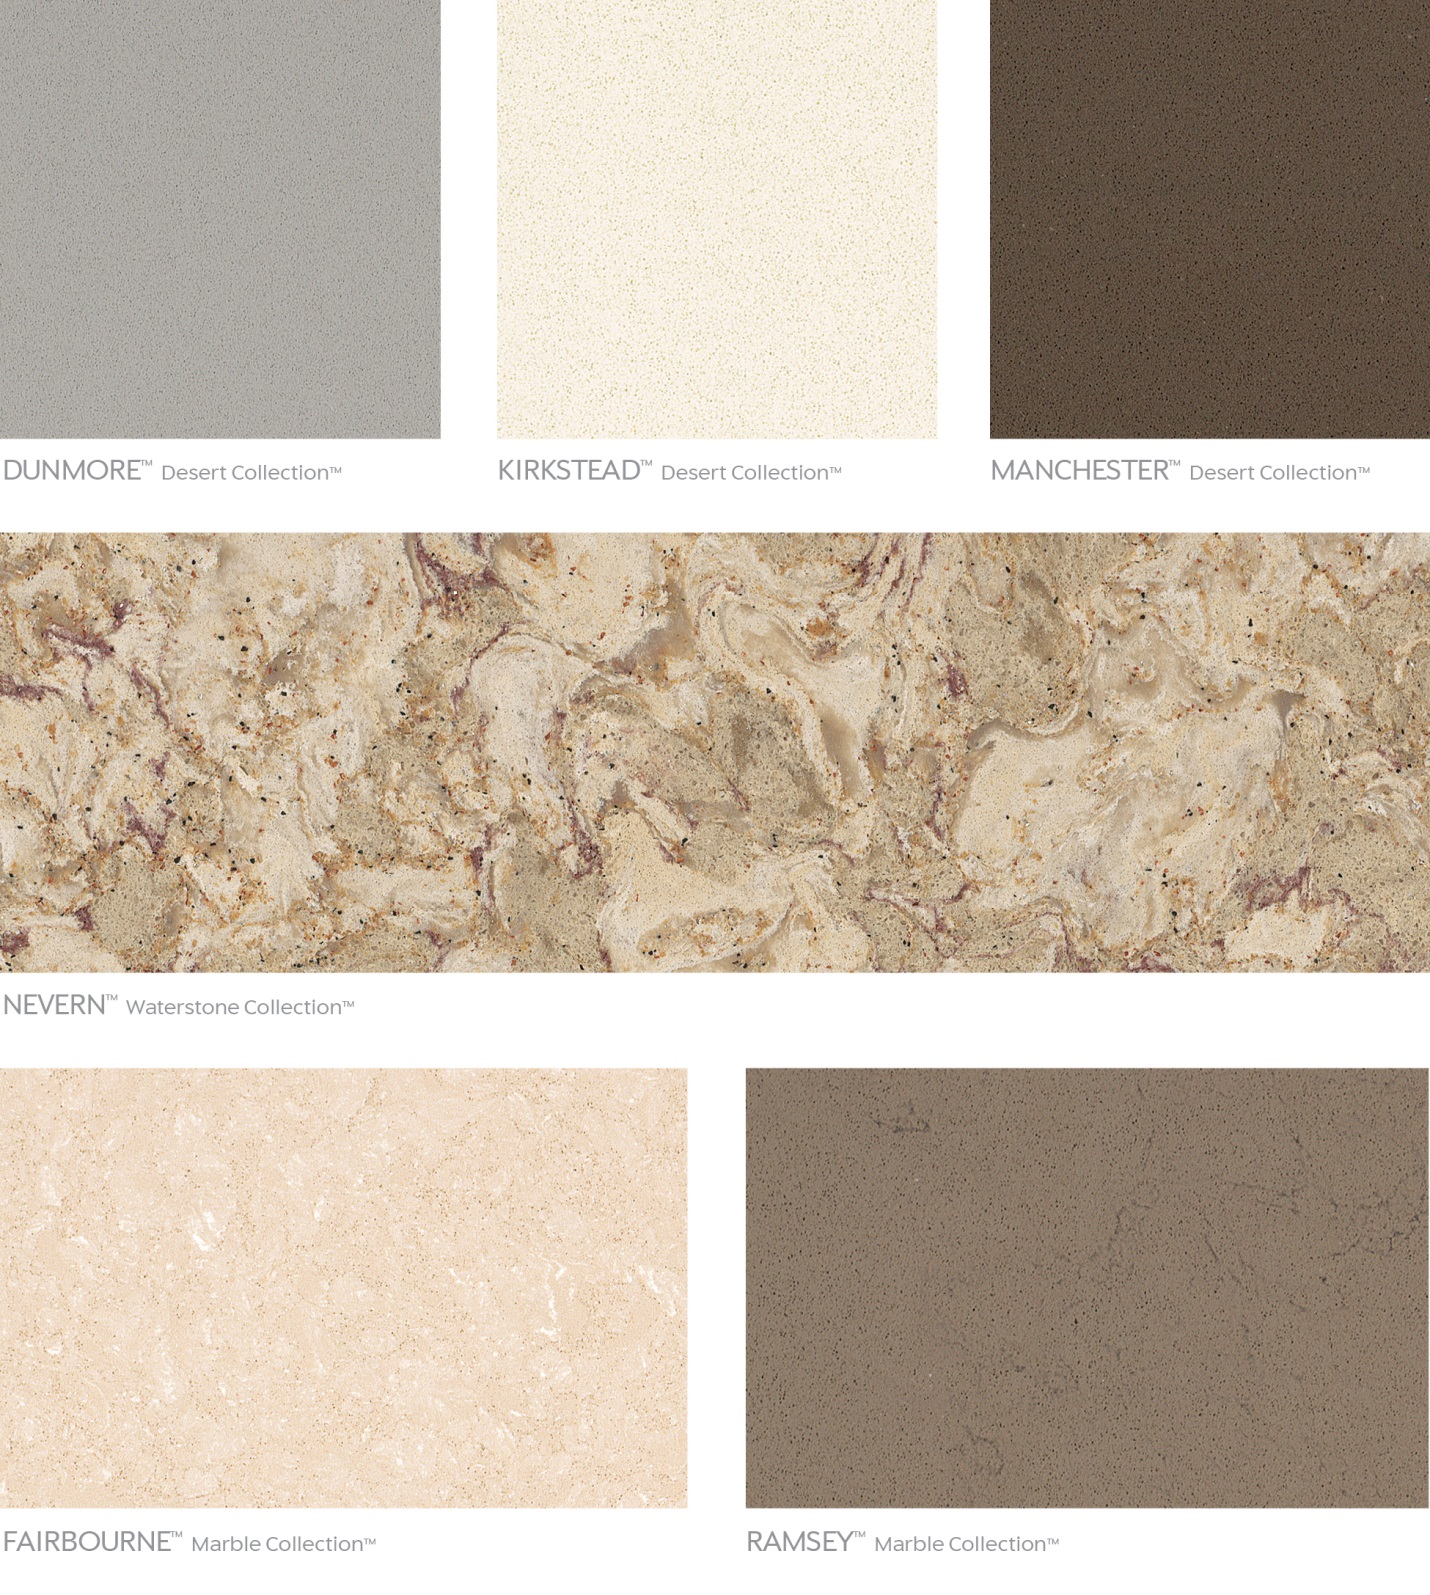 Cambria Coastal Collection S Newest Design Of Quartz: Cambria Introduces Six New Designs